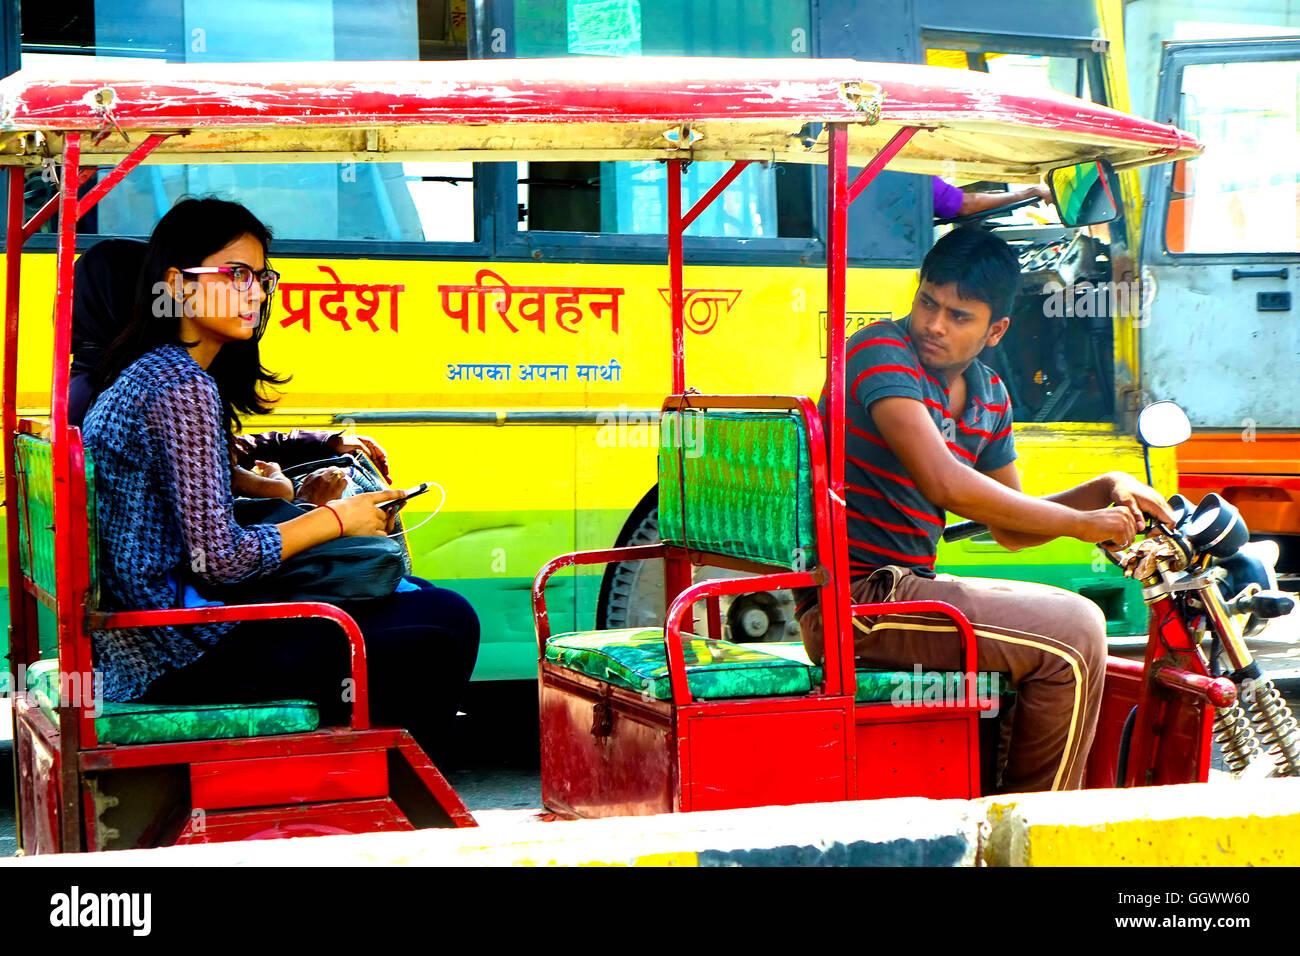 Eco-friendly 'auto' seen plying in NOIDA in Delhi-NCR, India - Stock Image